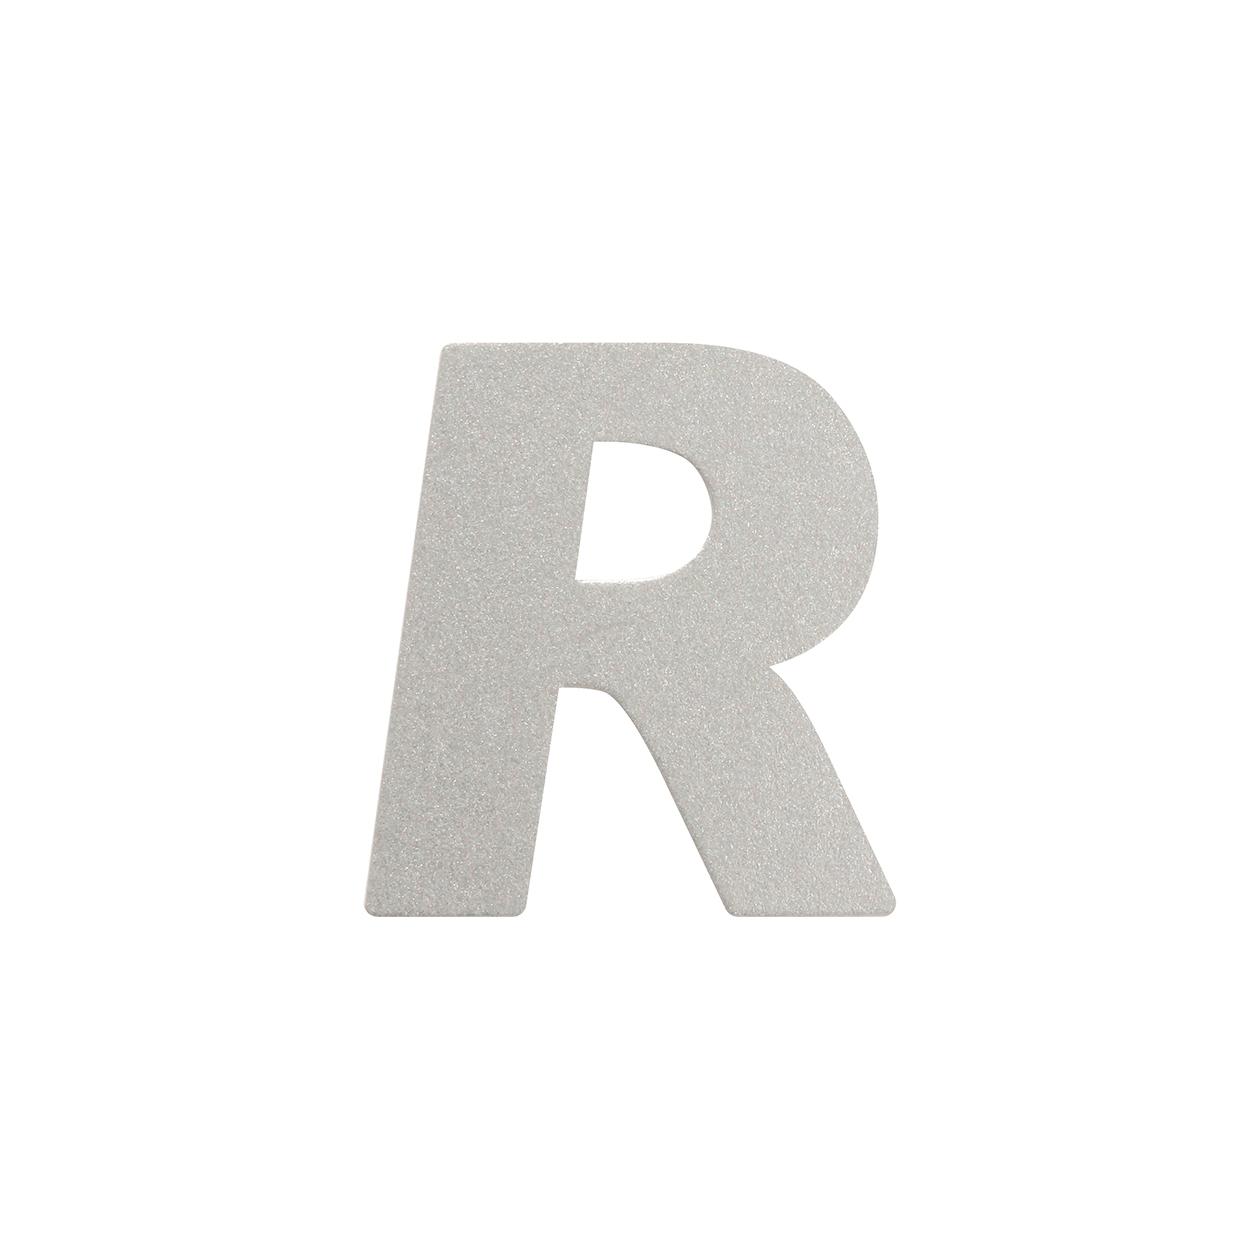 No.395ボード A7カードDC 文字R シルバー